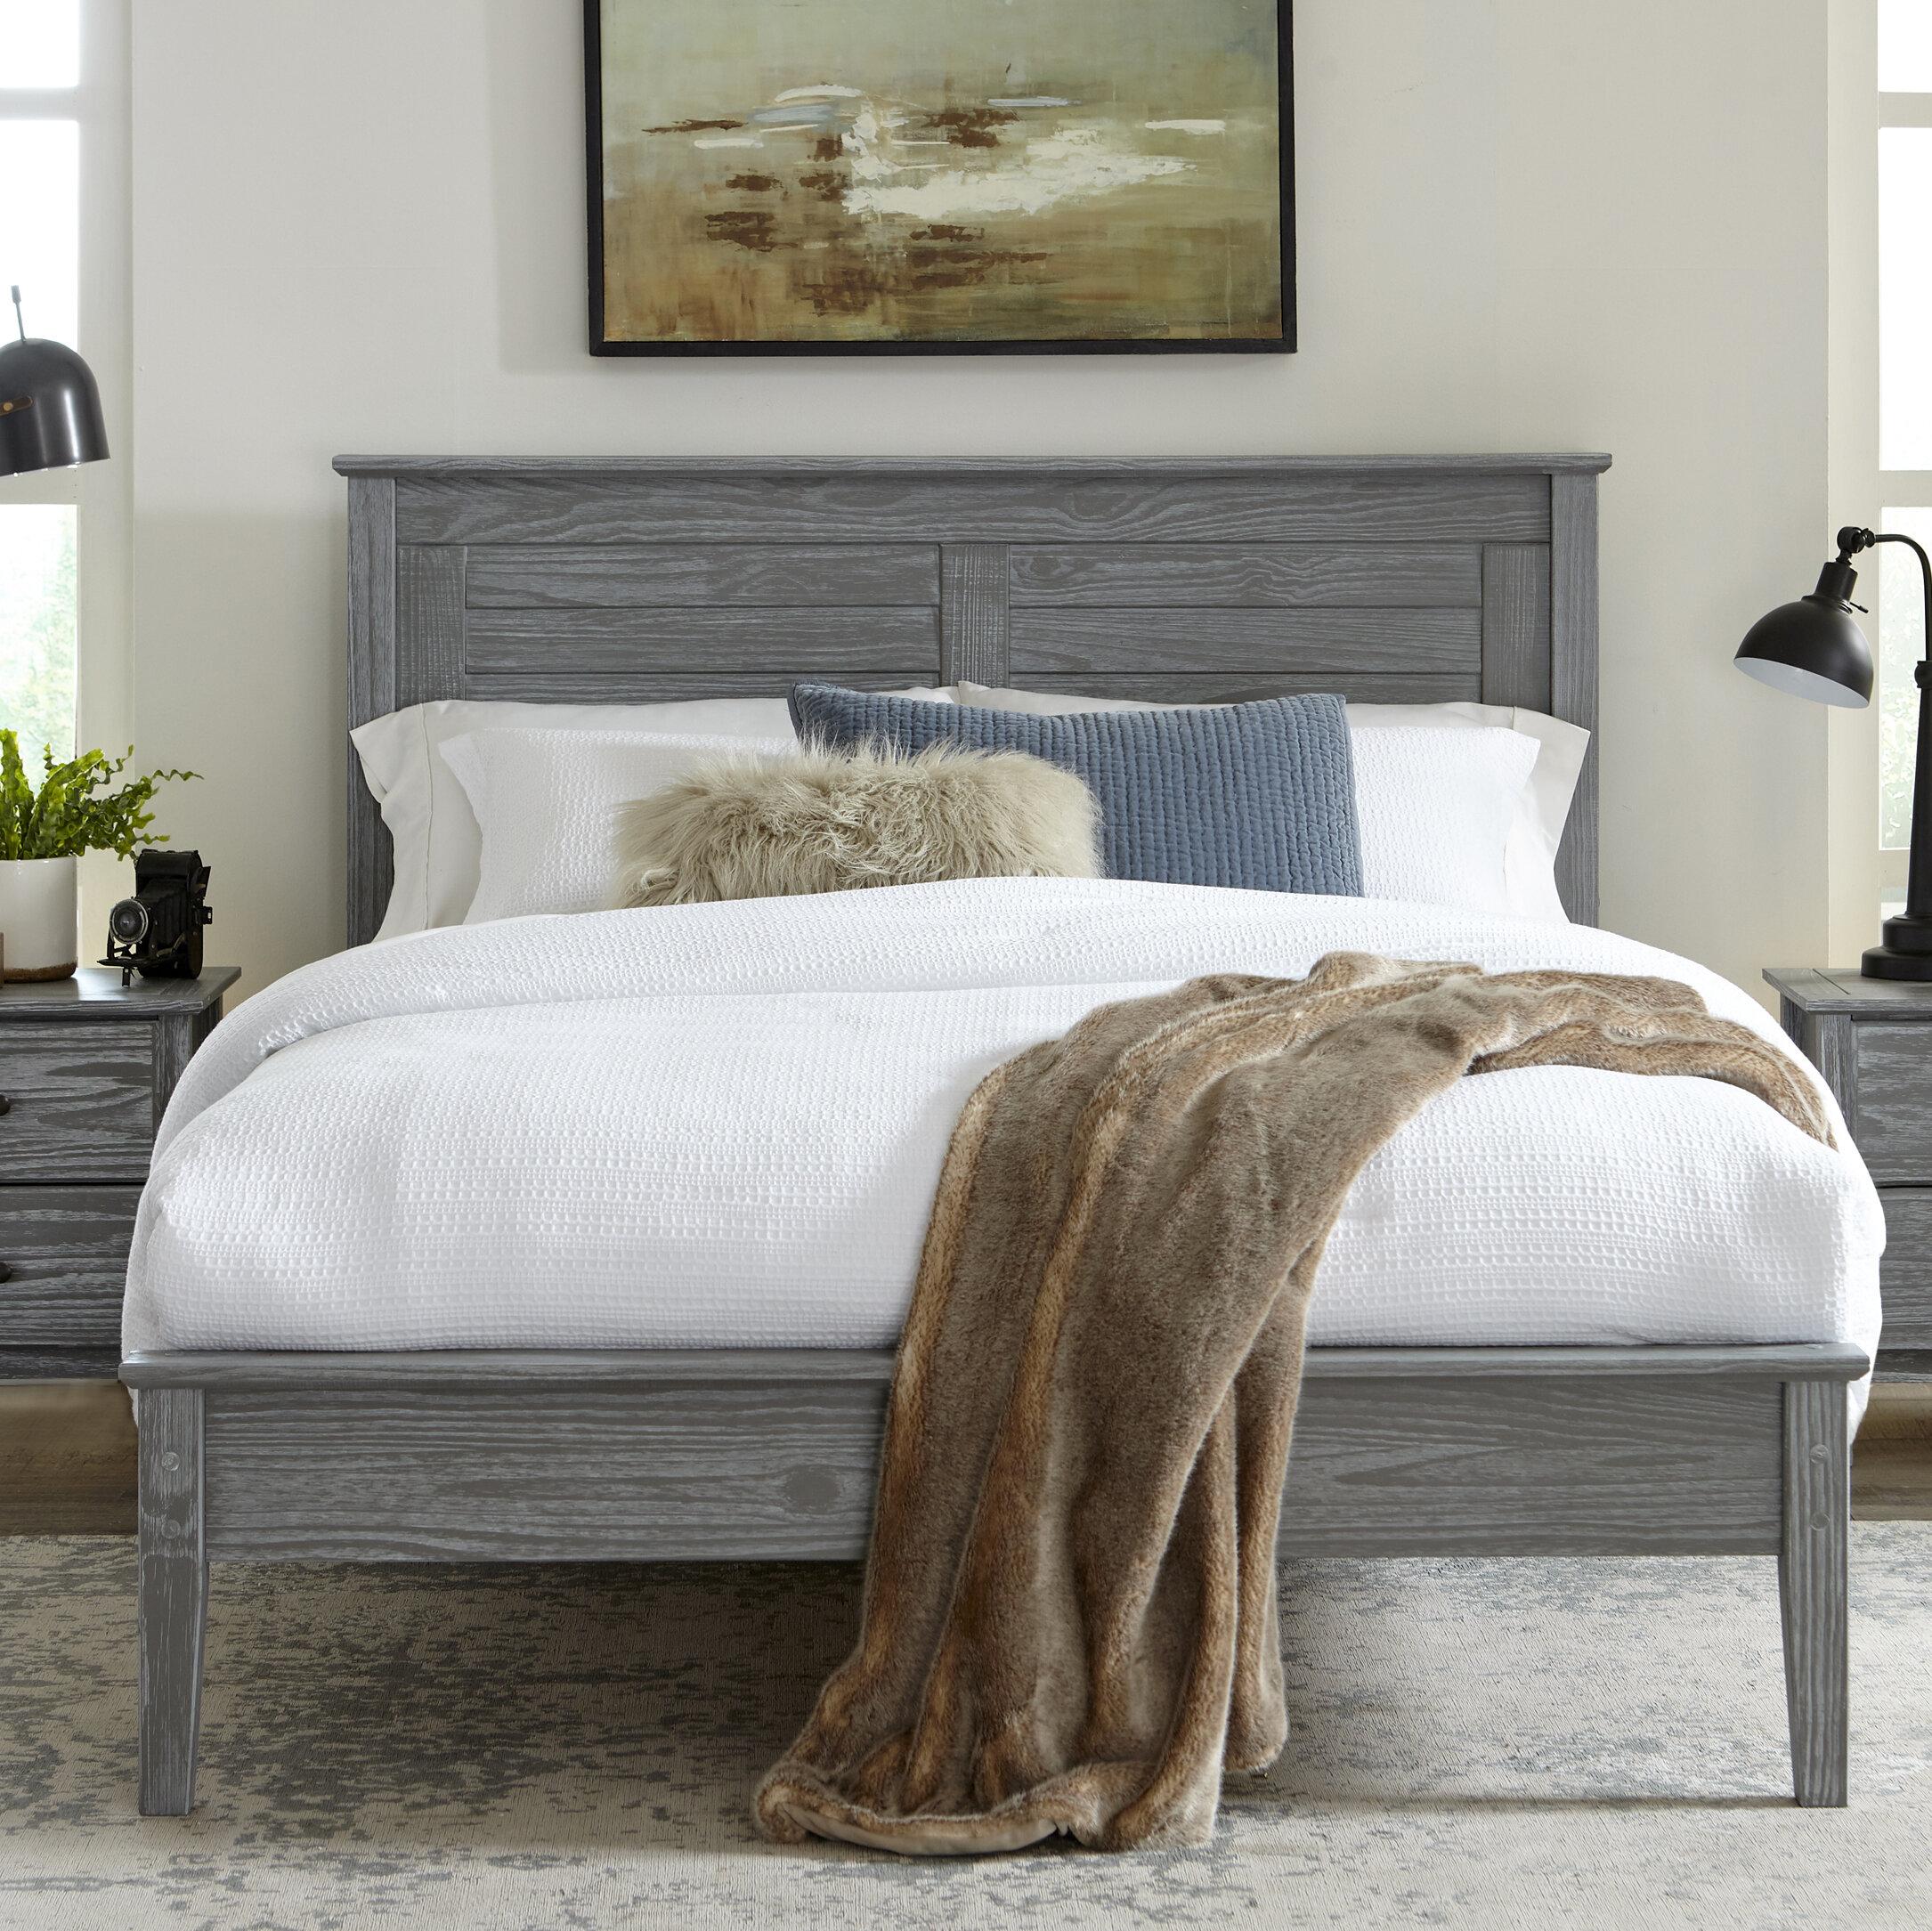 Blue Grey Bedroom Sets You Ll Love In 2021 Wayfair